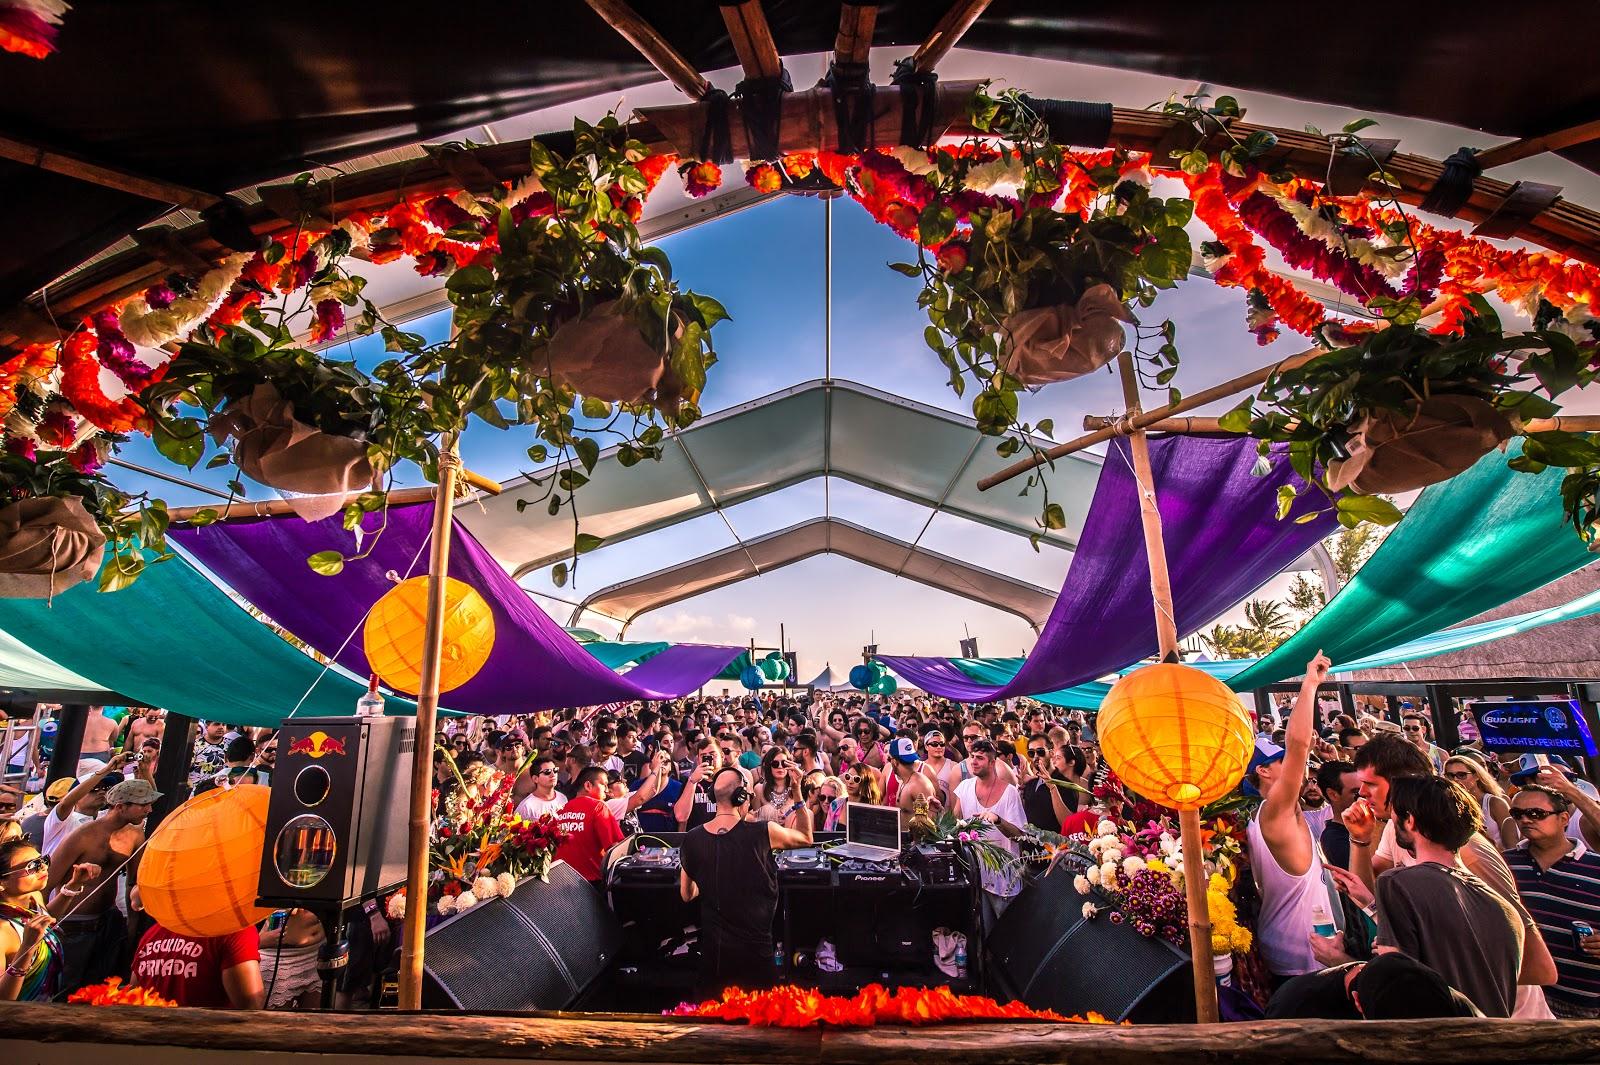 BPM Festival Announces New Destination and Dates for January 2020